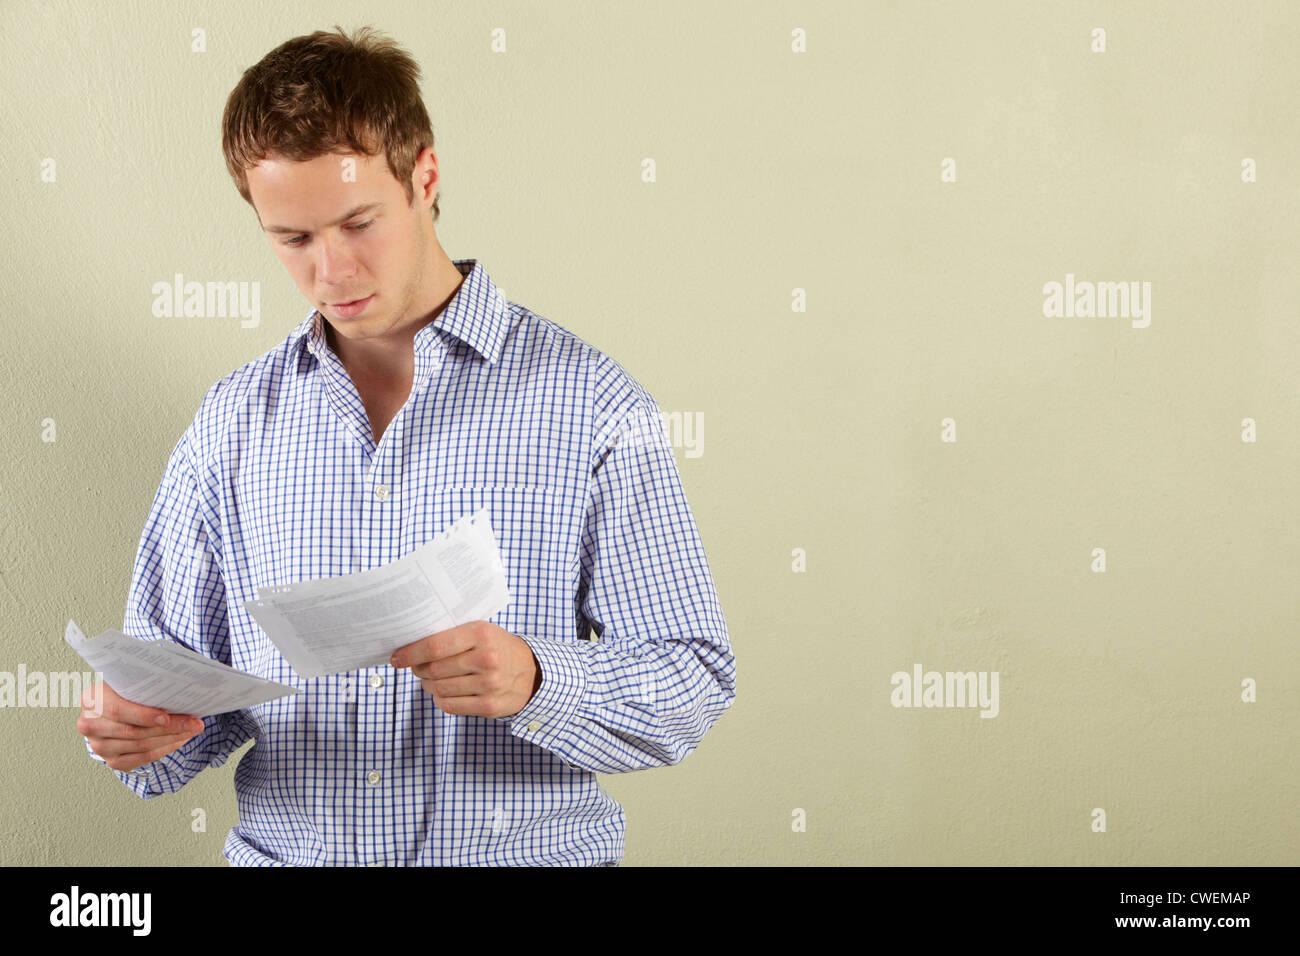 Studio Shot Of Young Man Looking at Bills - Stock Image